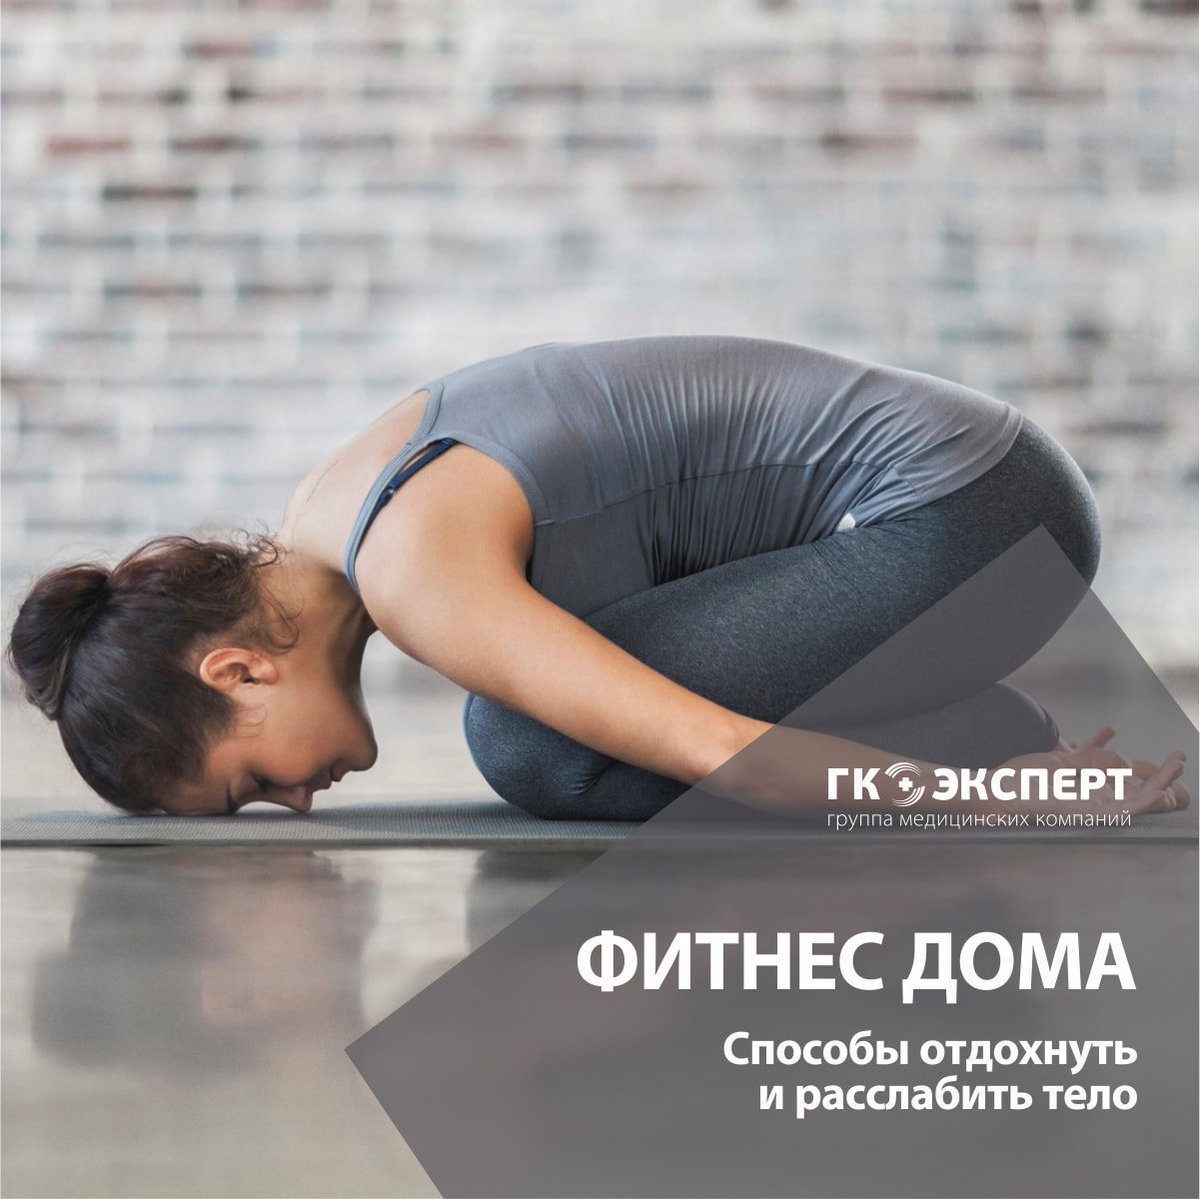 ho helped bring yoga - 720×810